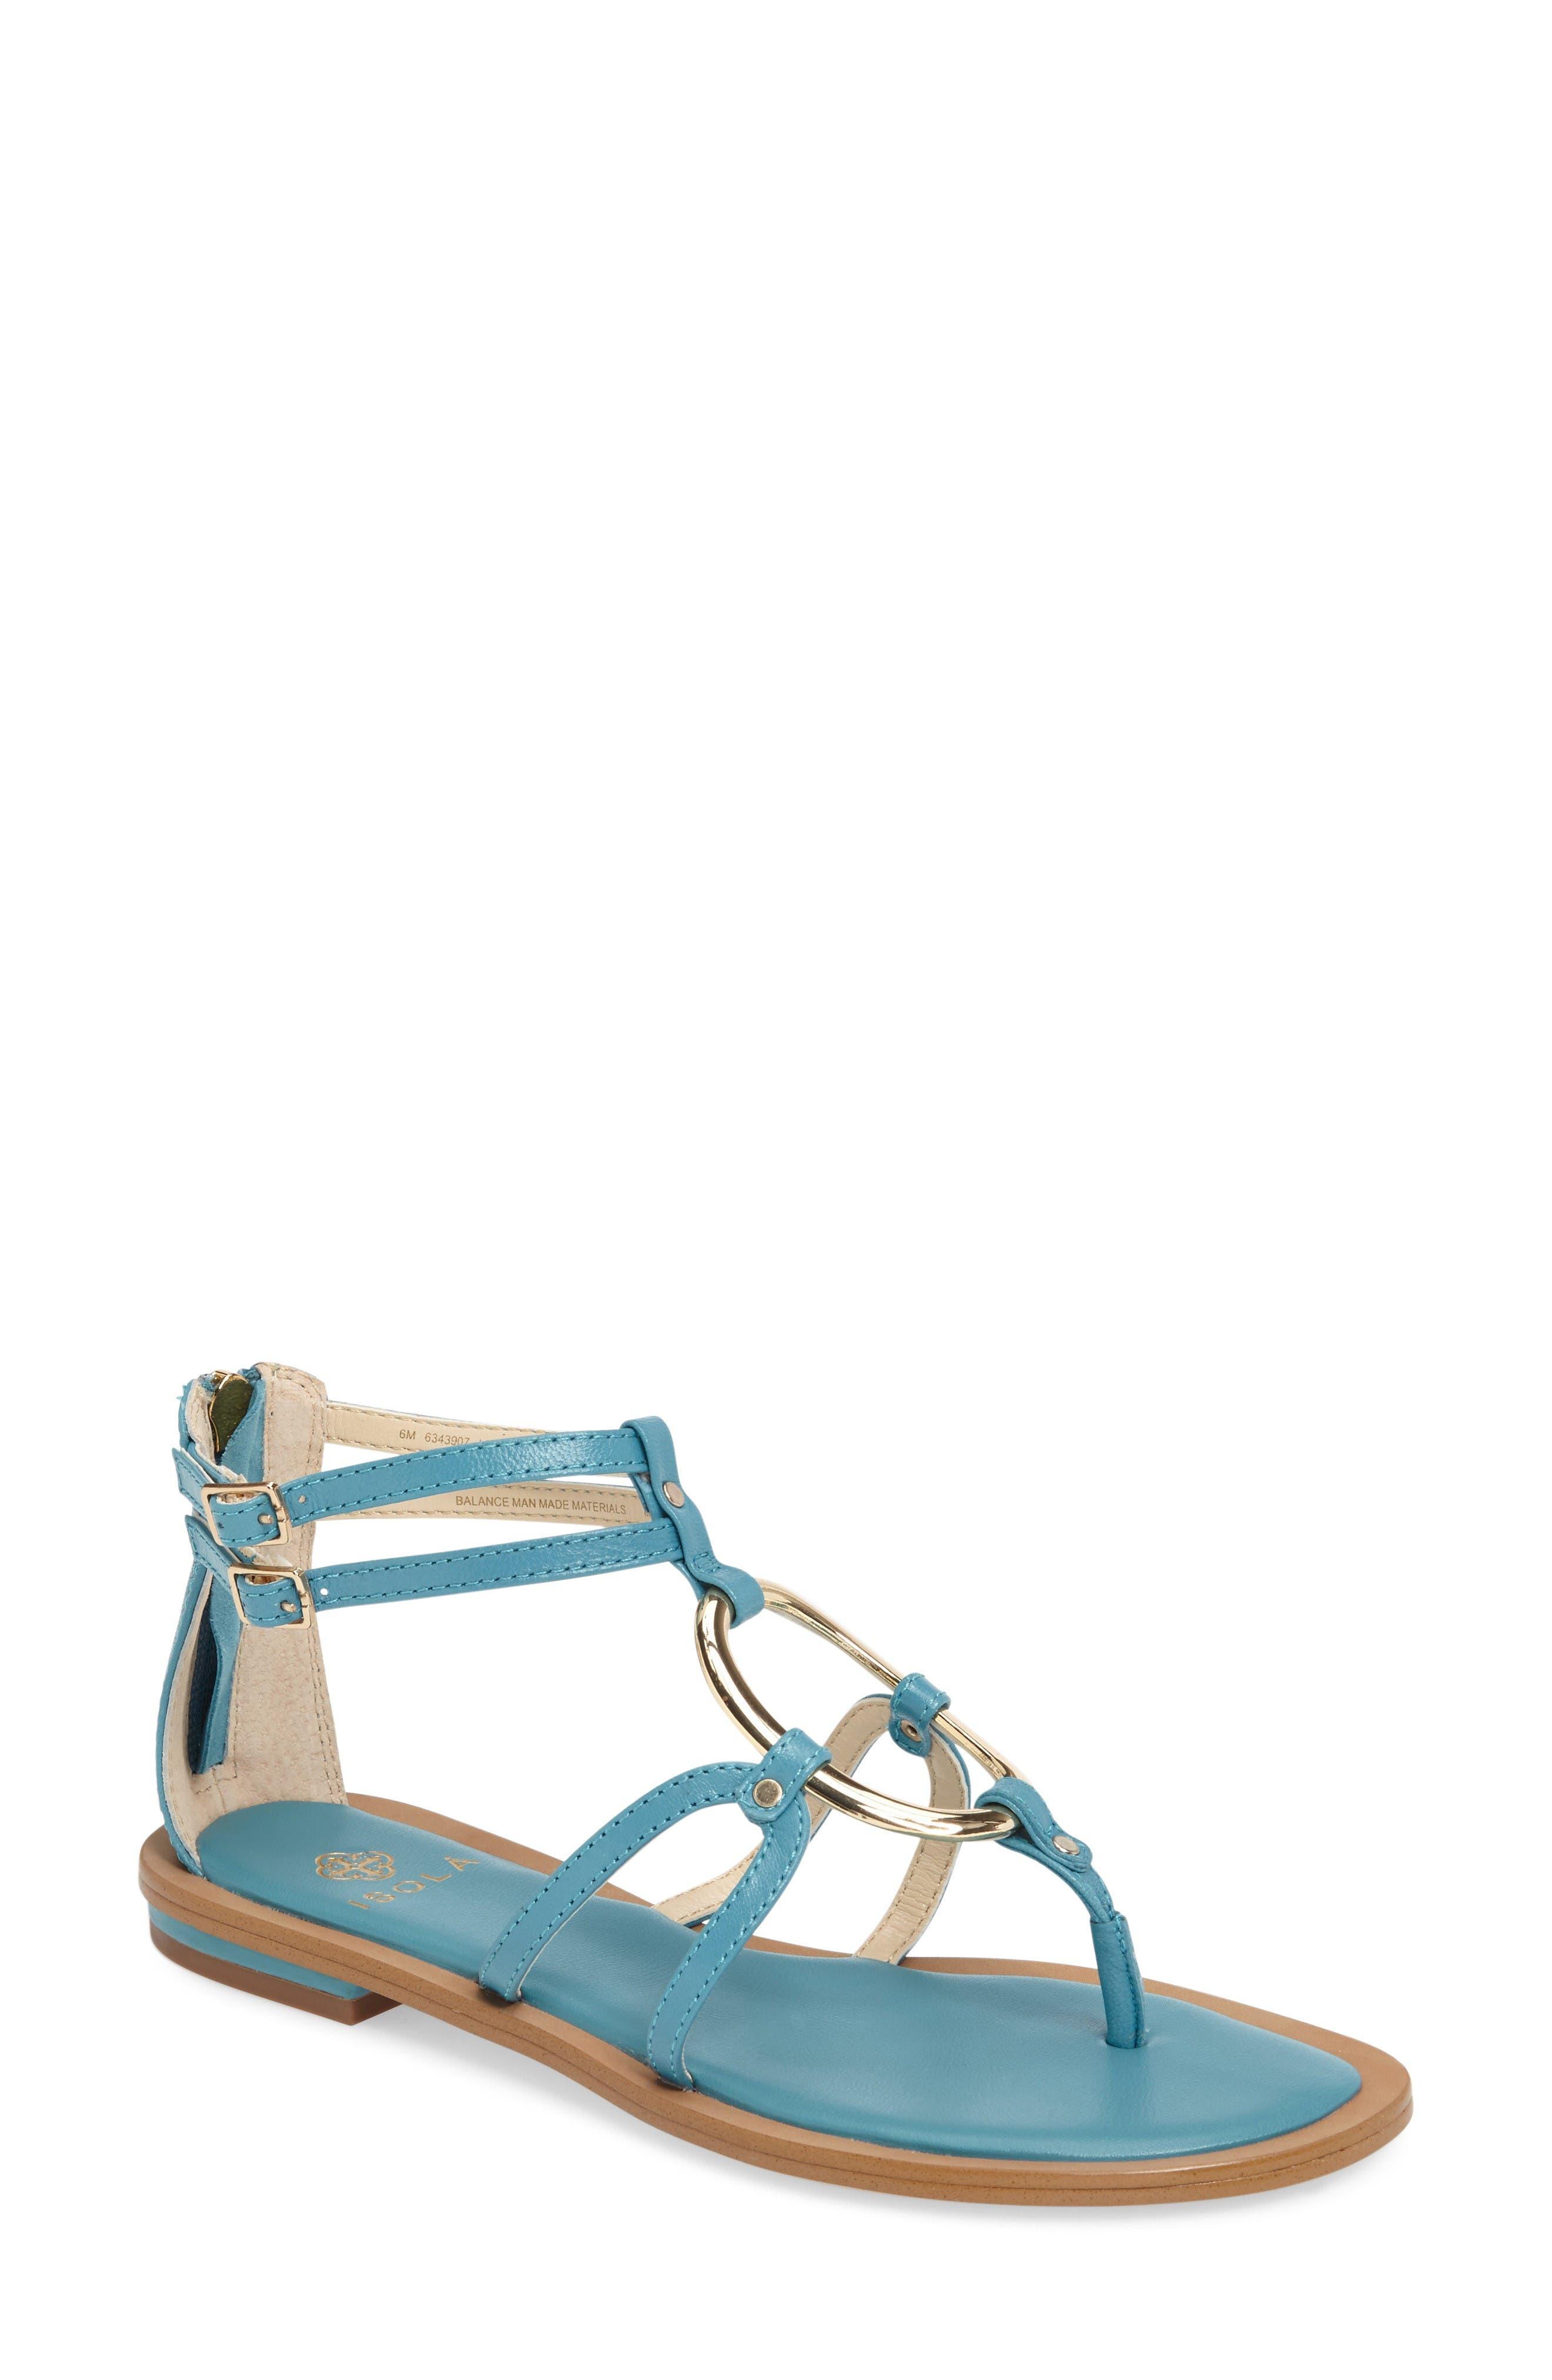 Melaney Sandal,                         Main,                         color, Aqua Leather